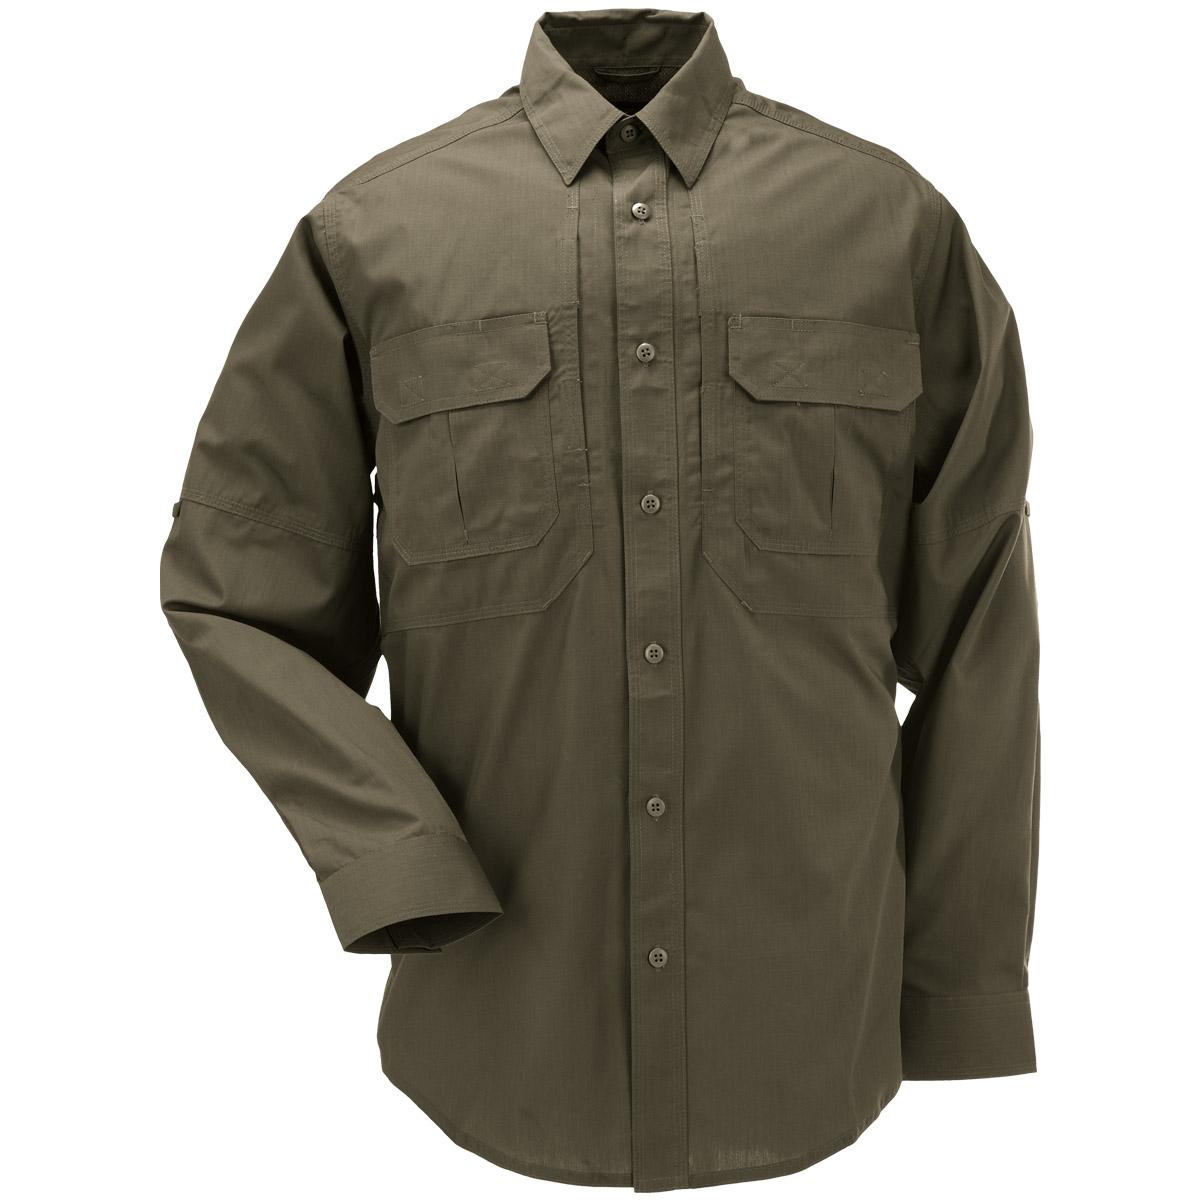 Taclite pro army tactical security mens shirt long for 5 11 tactical taclite pro short sleeve shirt